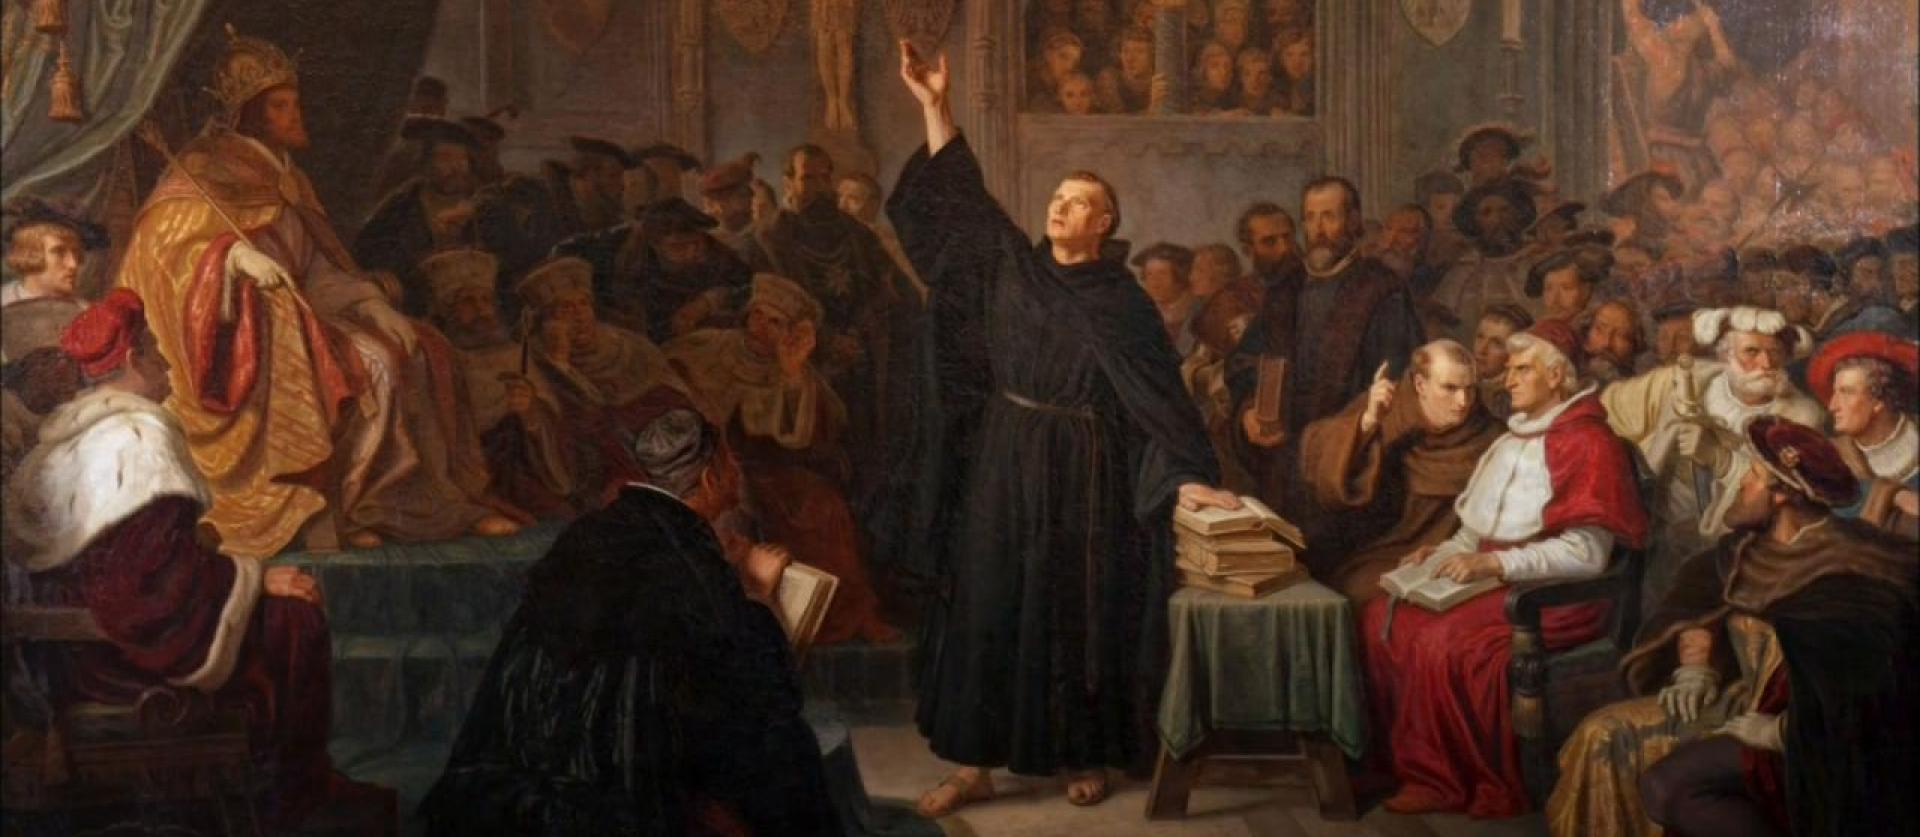 lutherreformation.jpg